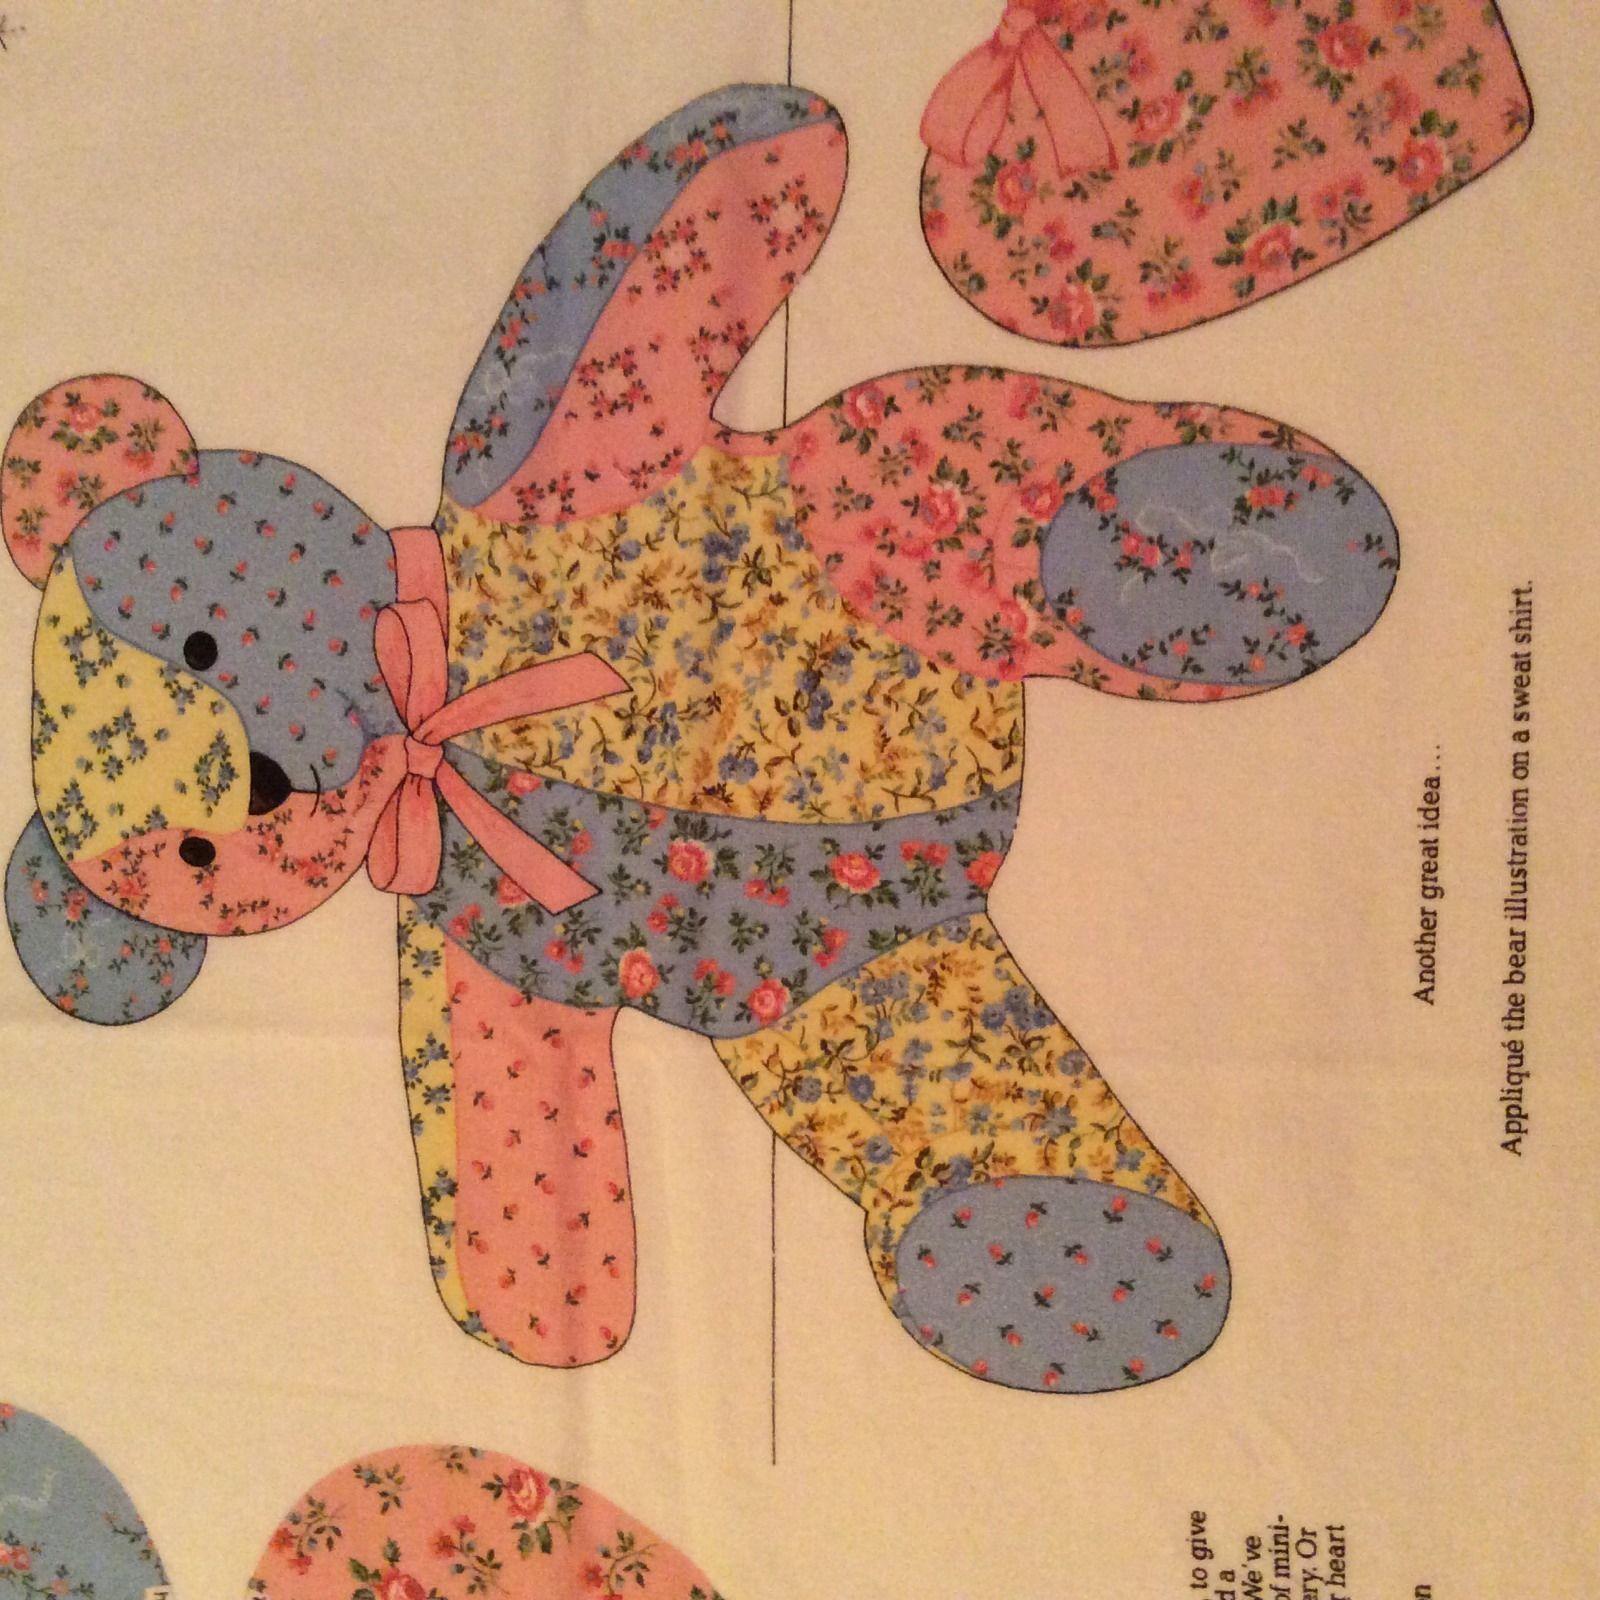 Vintage Calico Patchwork Teddy Bear Fabric Panel VIP Cranston